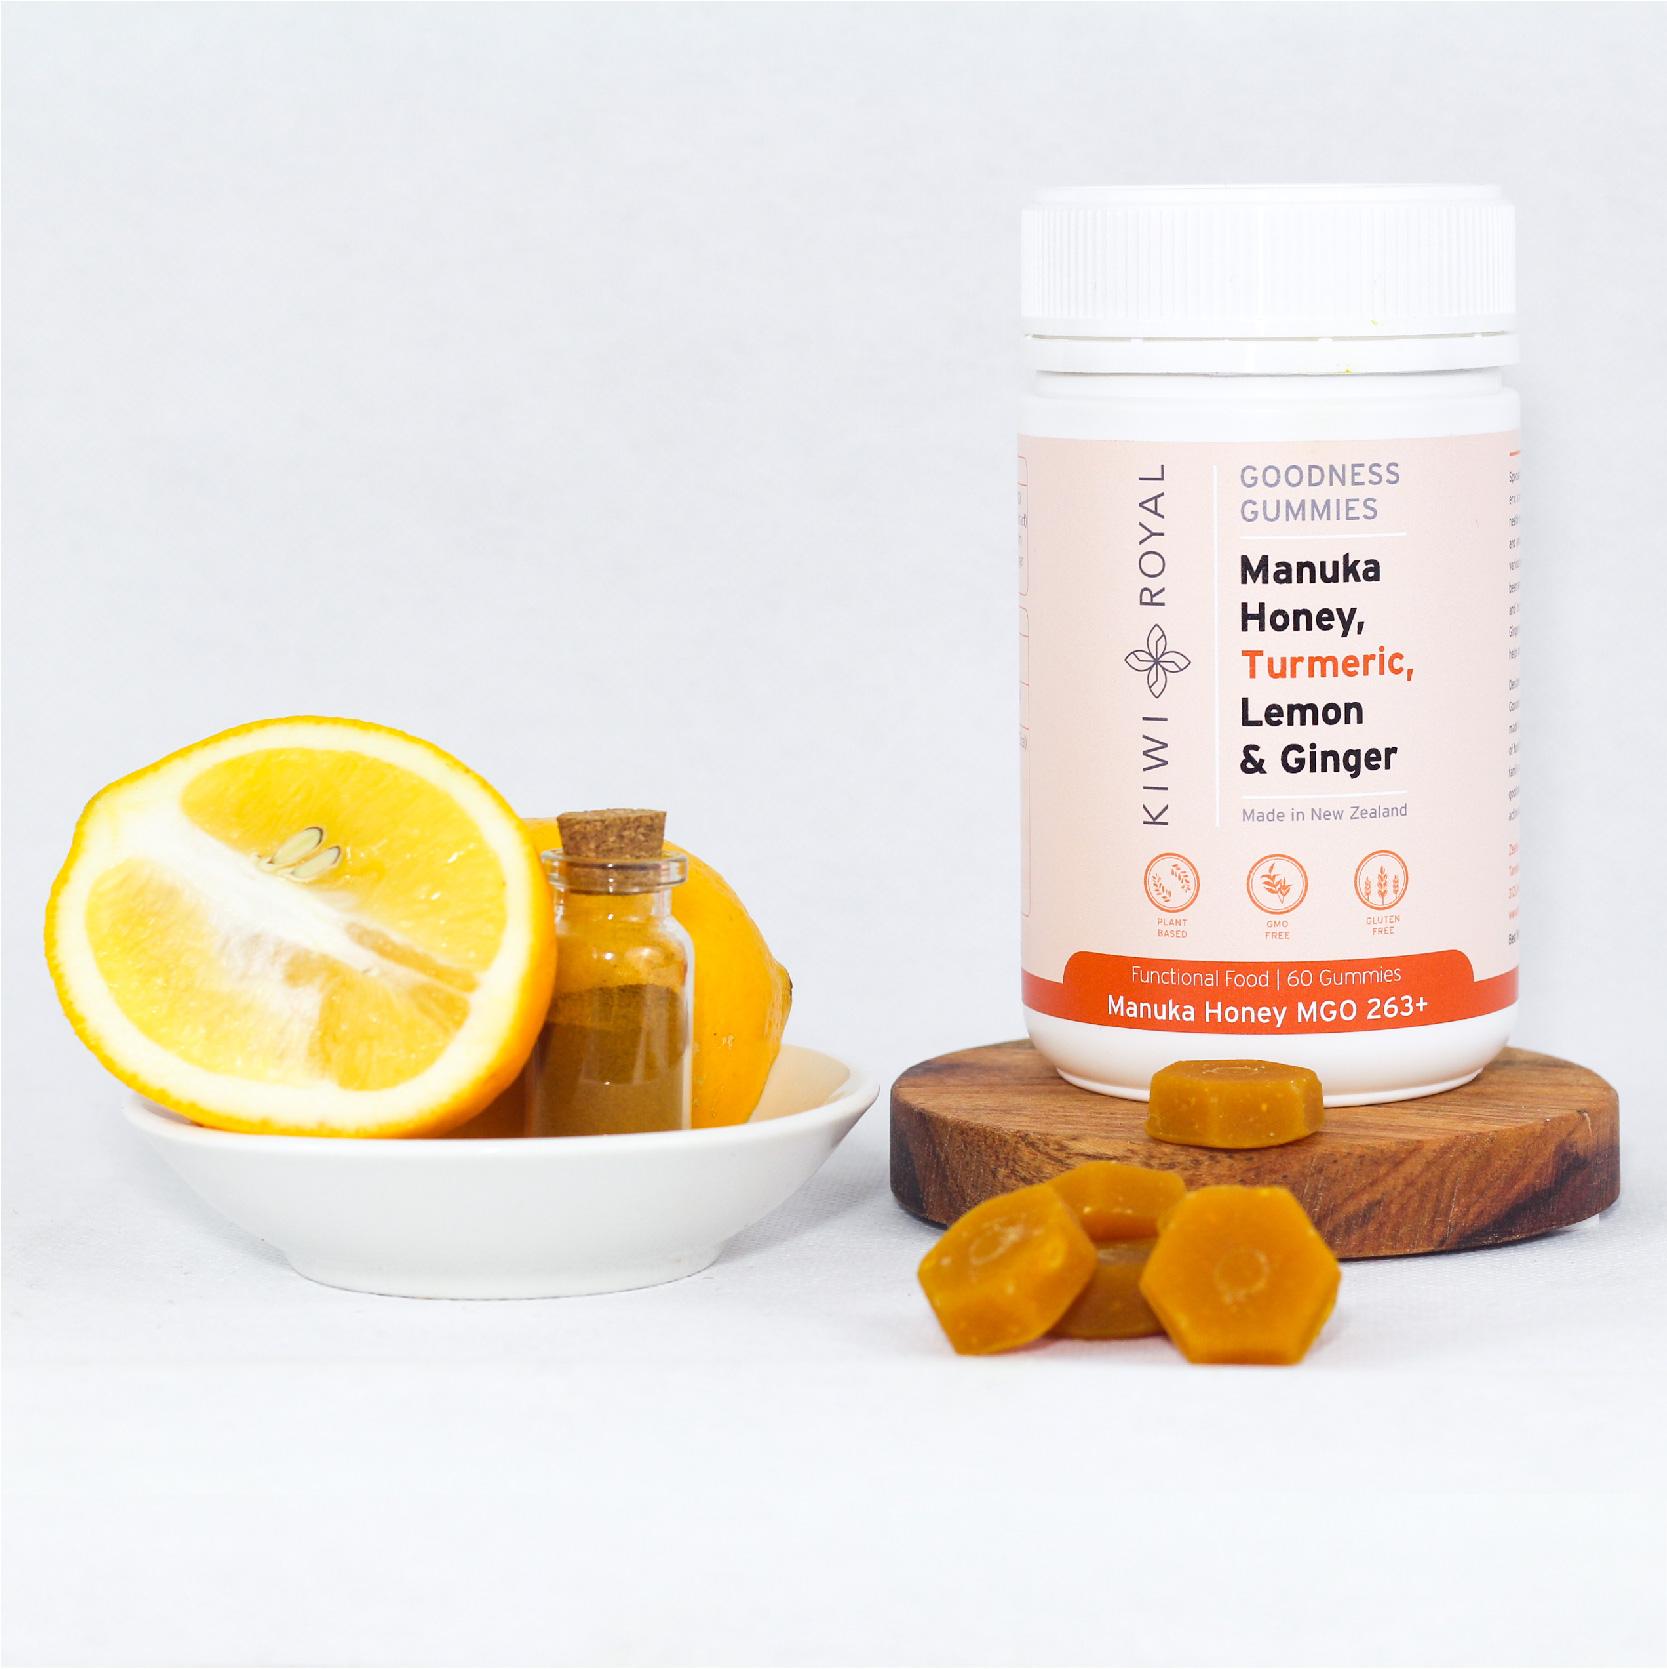 Manuka Honey, Turmeric, Ginger and Lemon